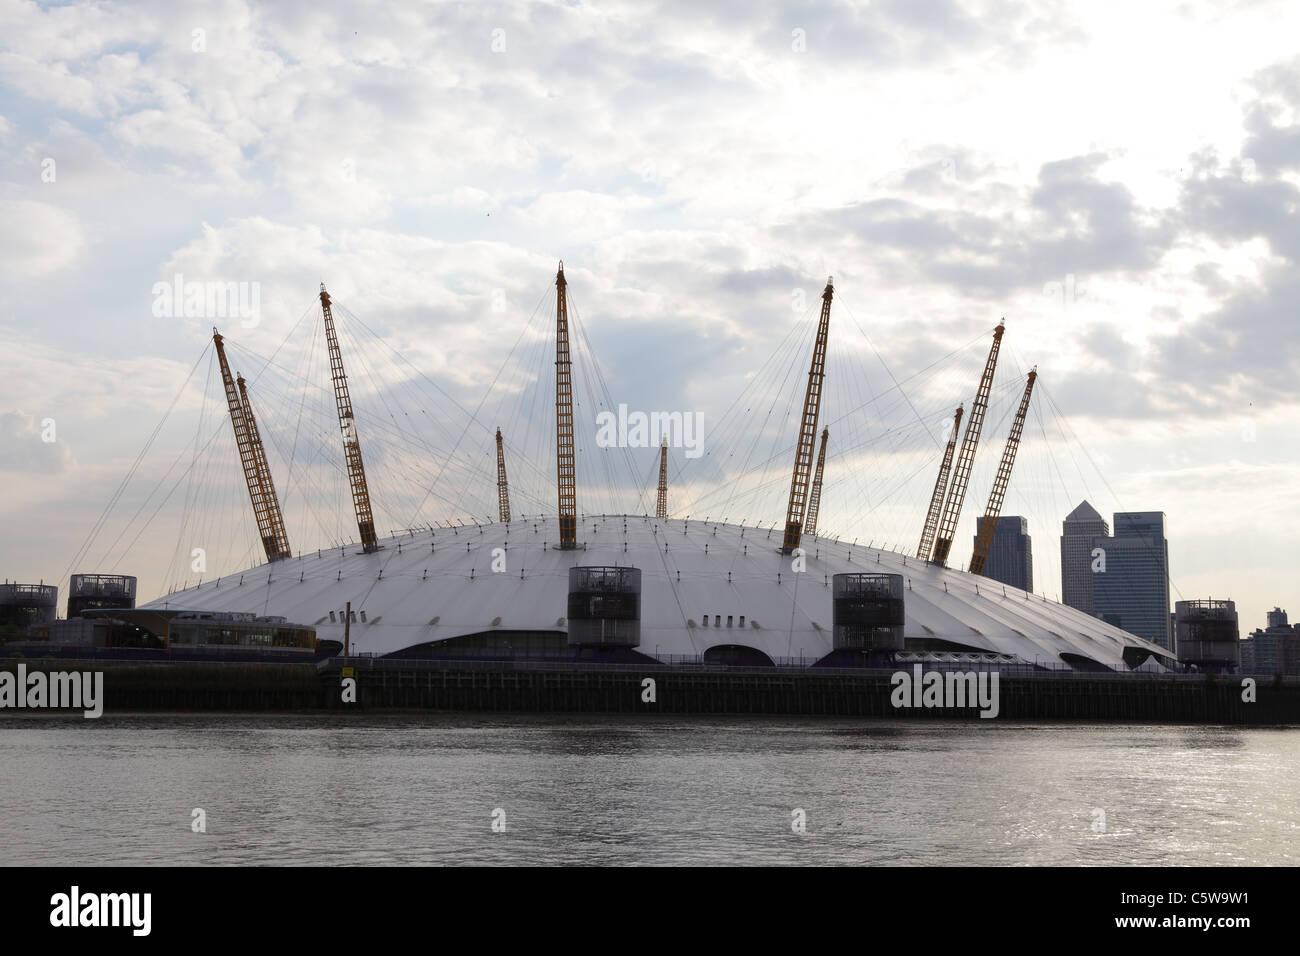 The O2 Arena Millennium Dome venue London, England, UK, GB - Stock Image